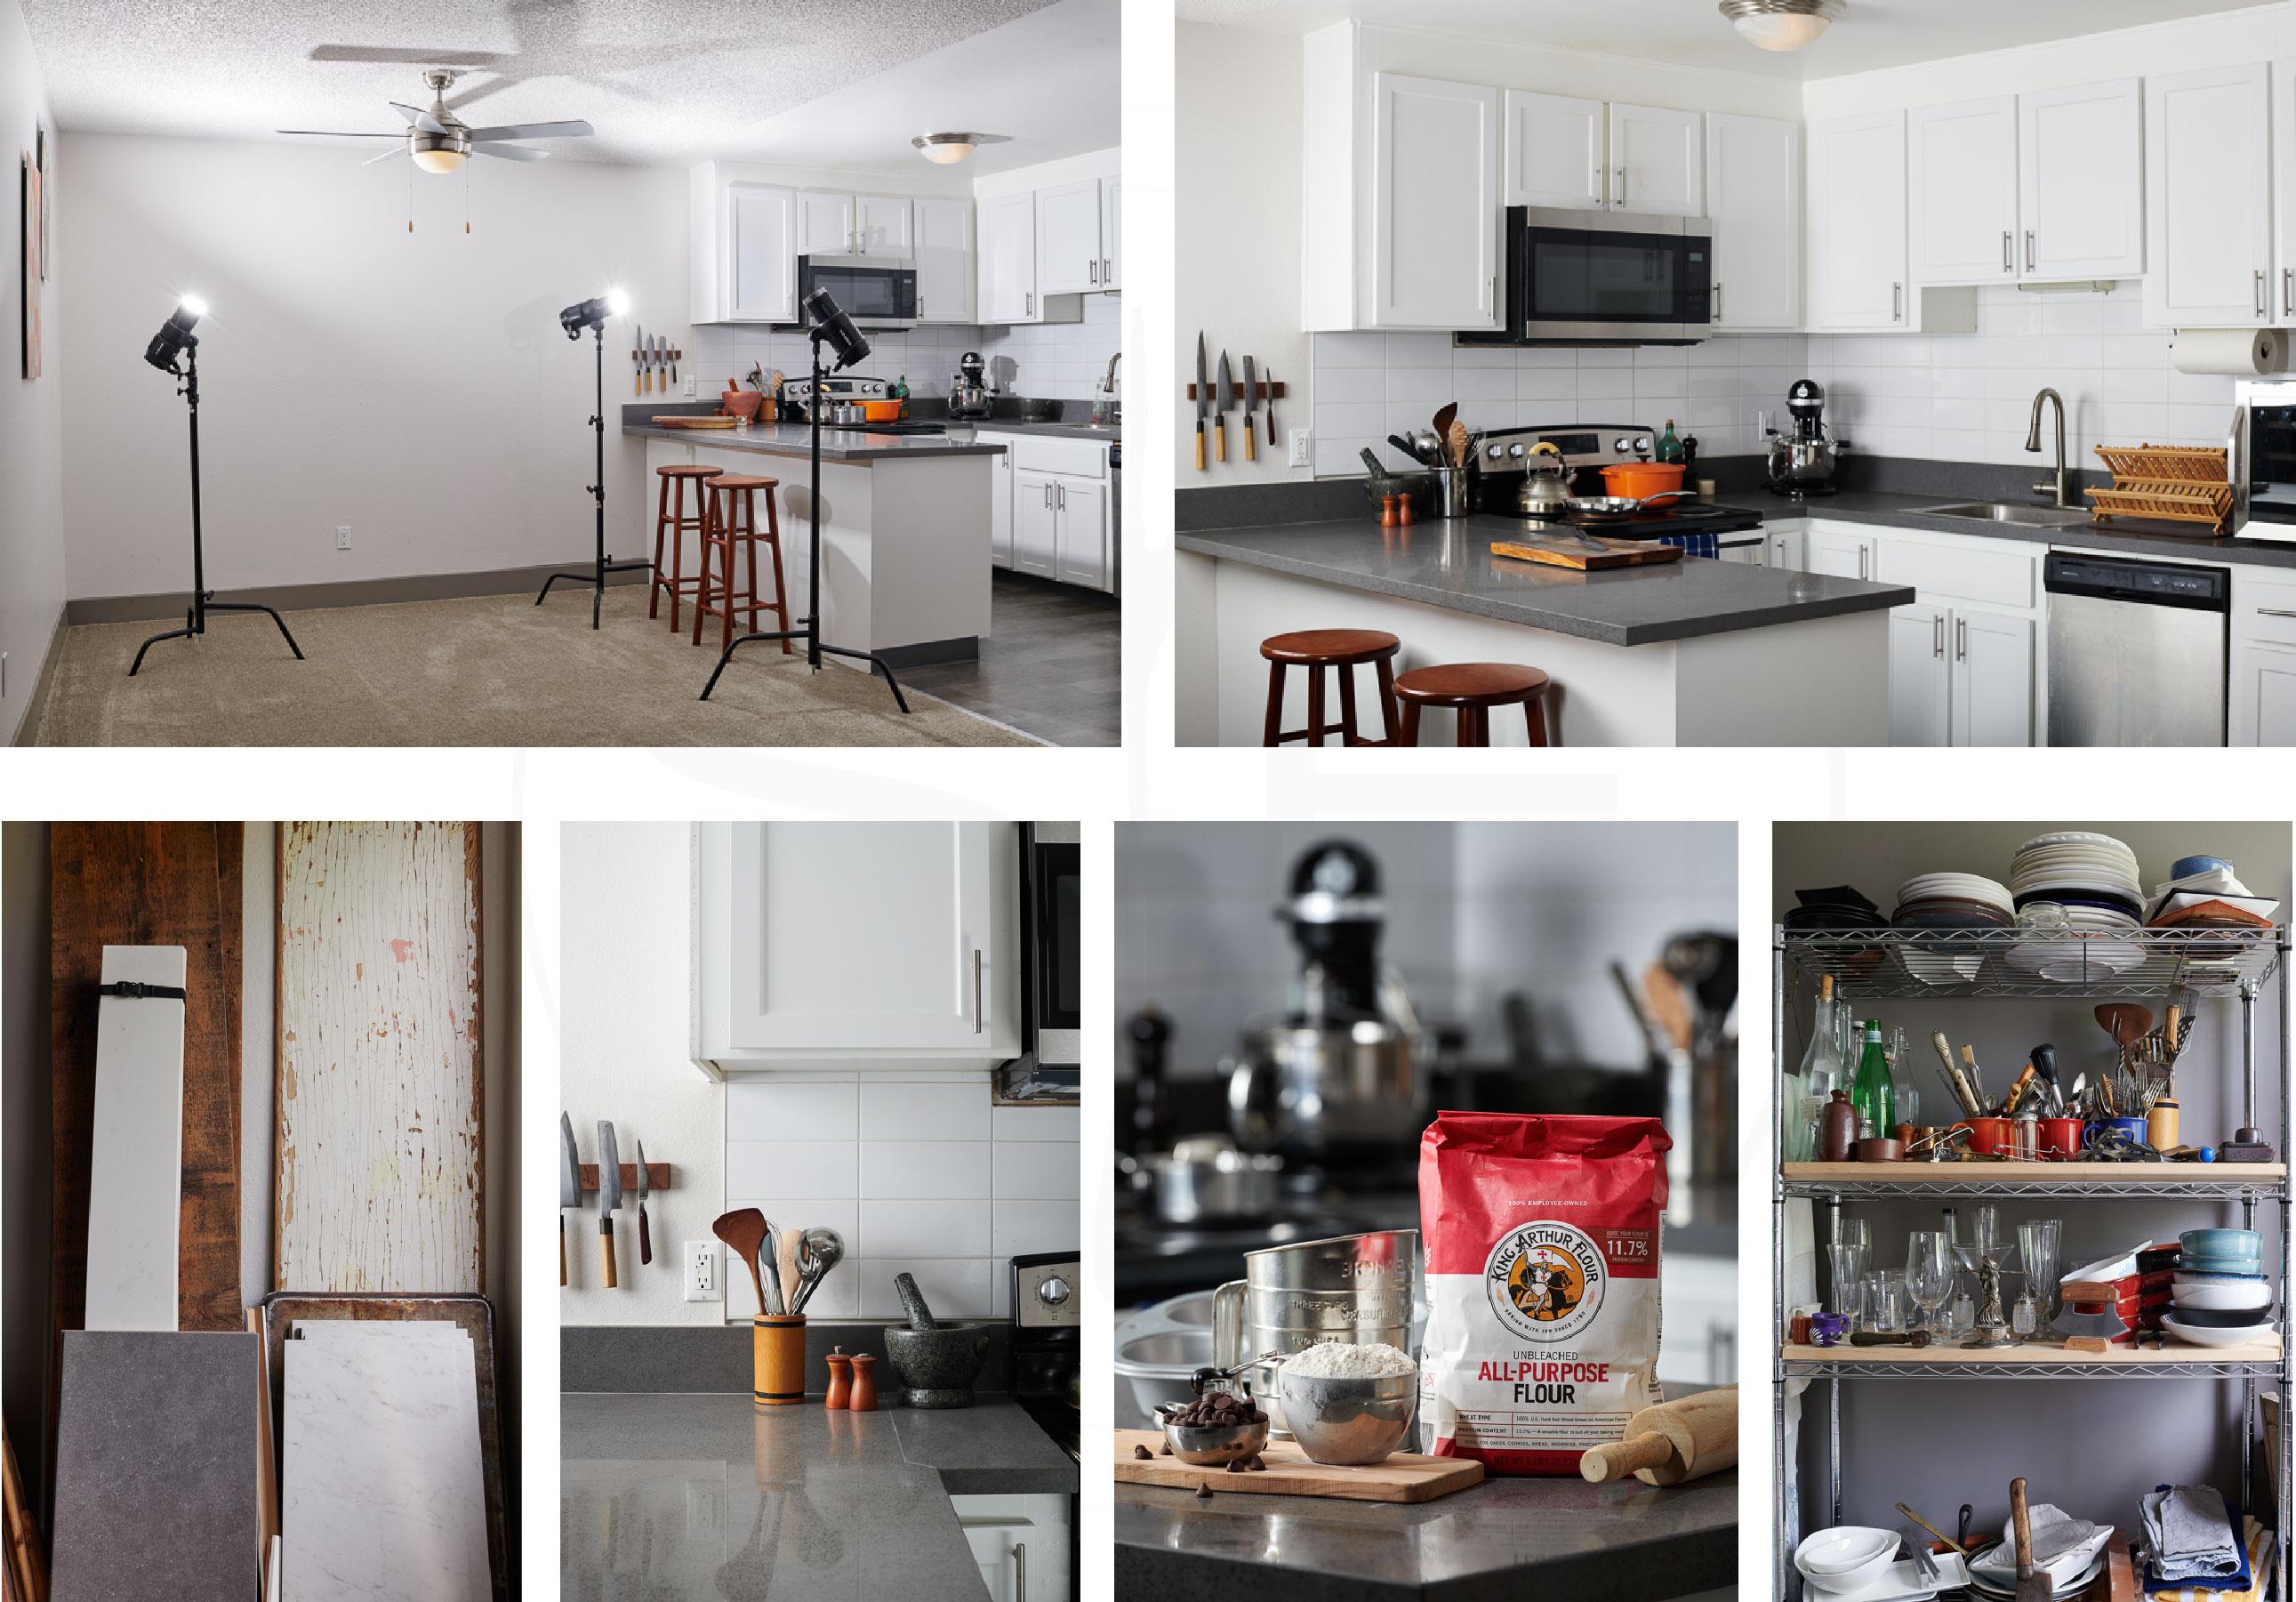 Phoode, food photographer, food photography, food stylist, food styling, home food photography studio, covid19 food photoshoot, remote food photoshoot, shooting remotely, remote food photography,